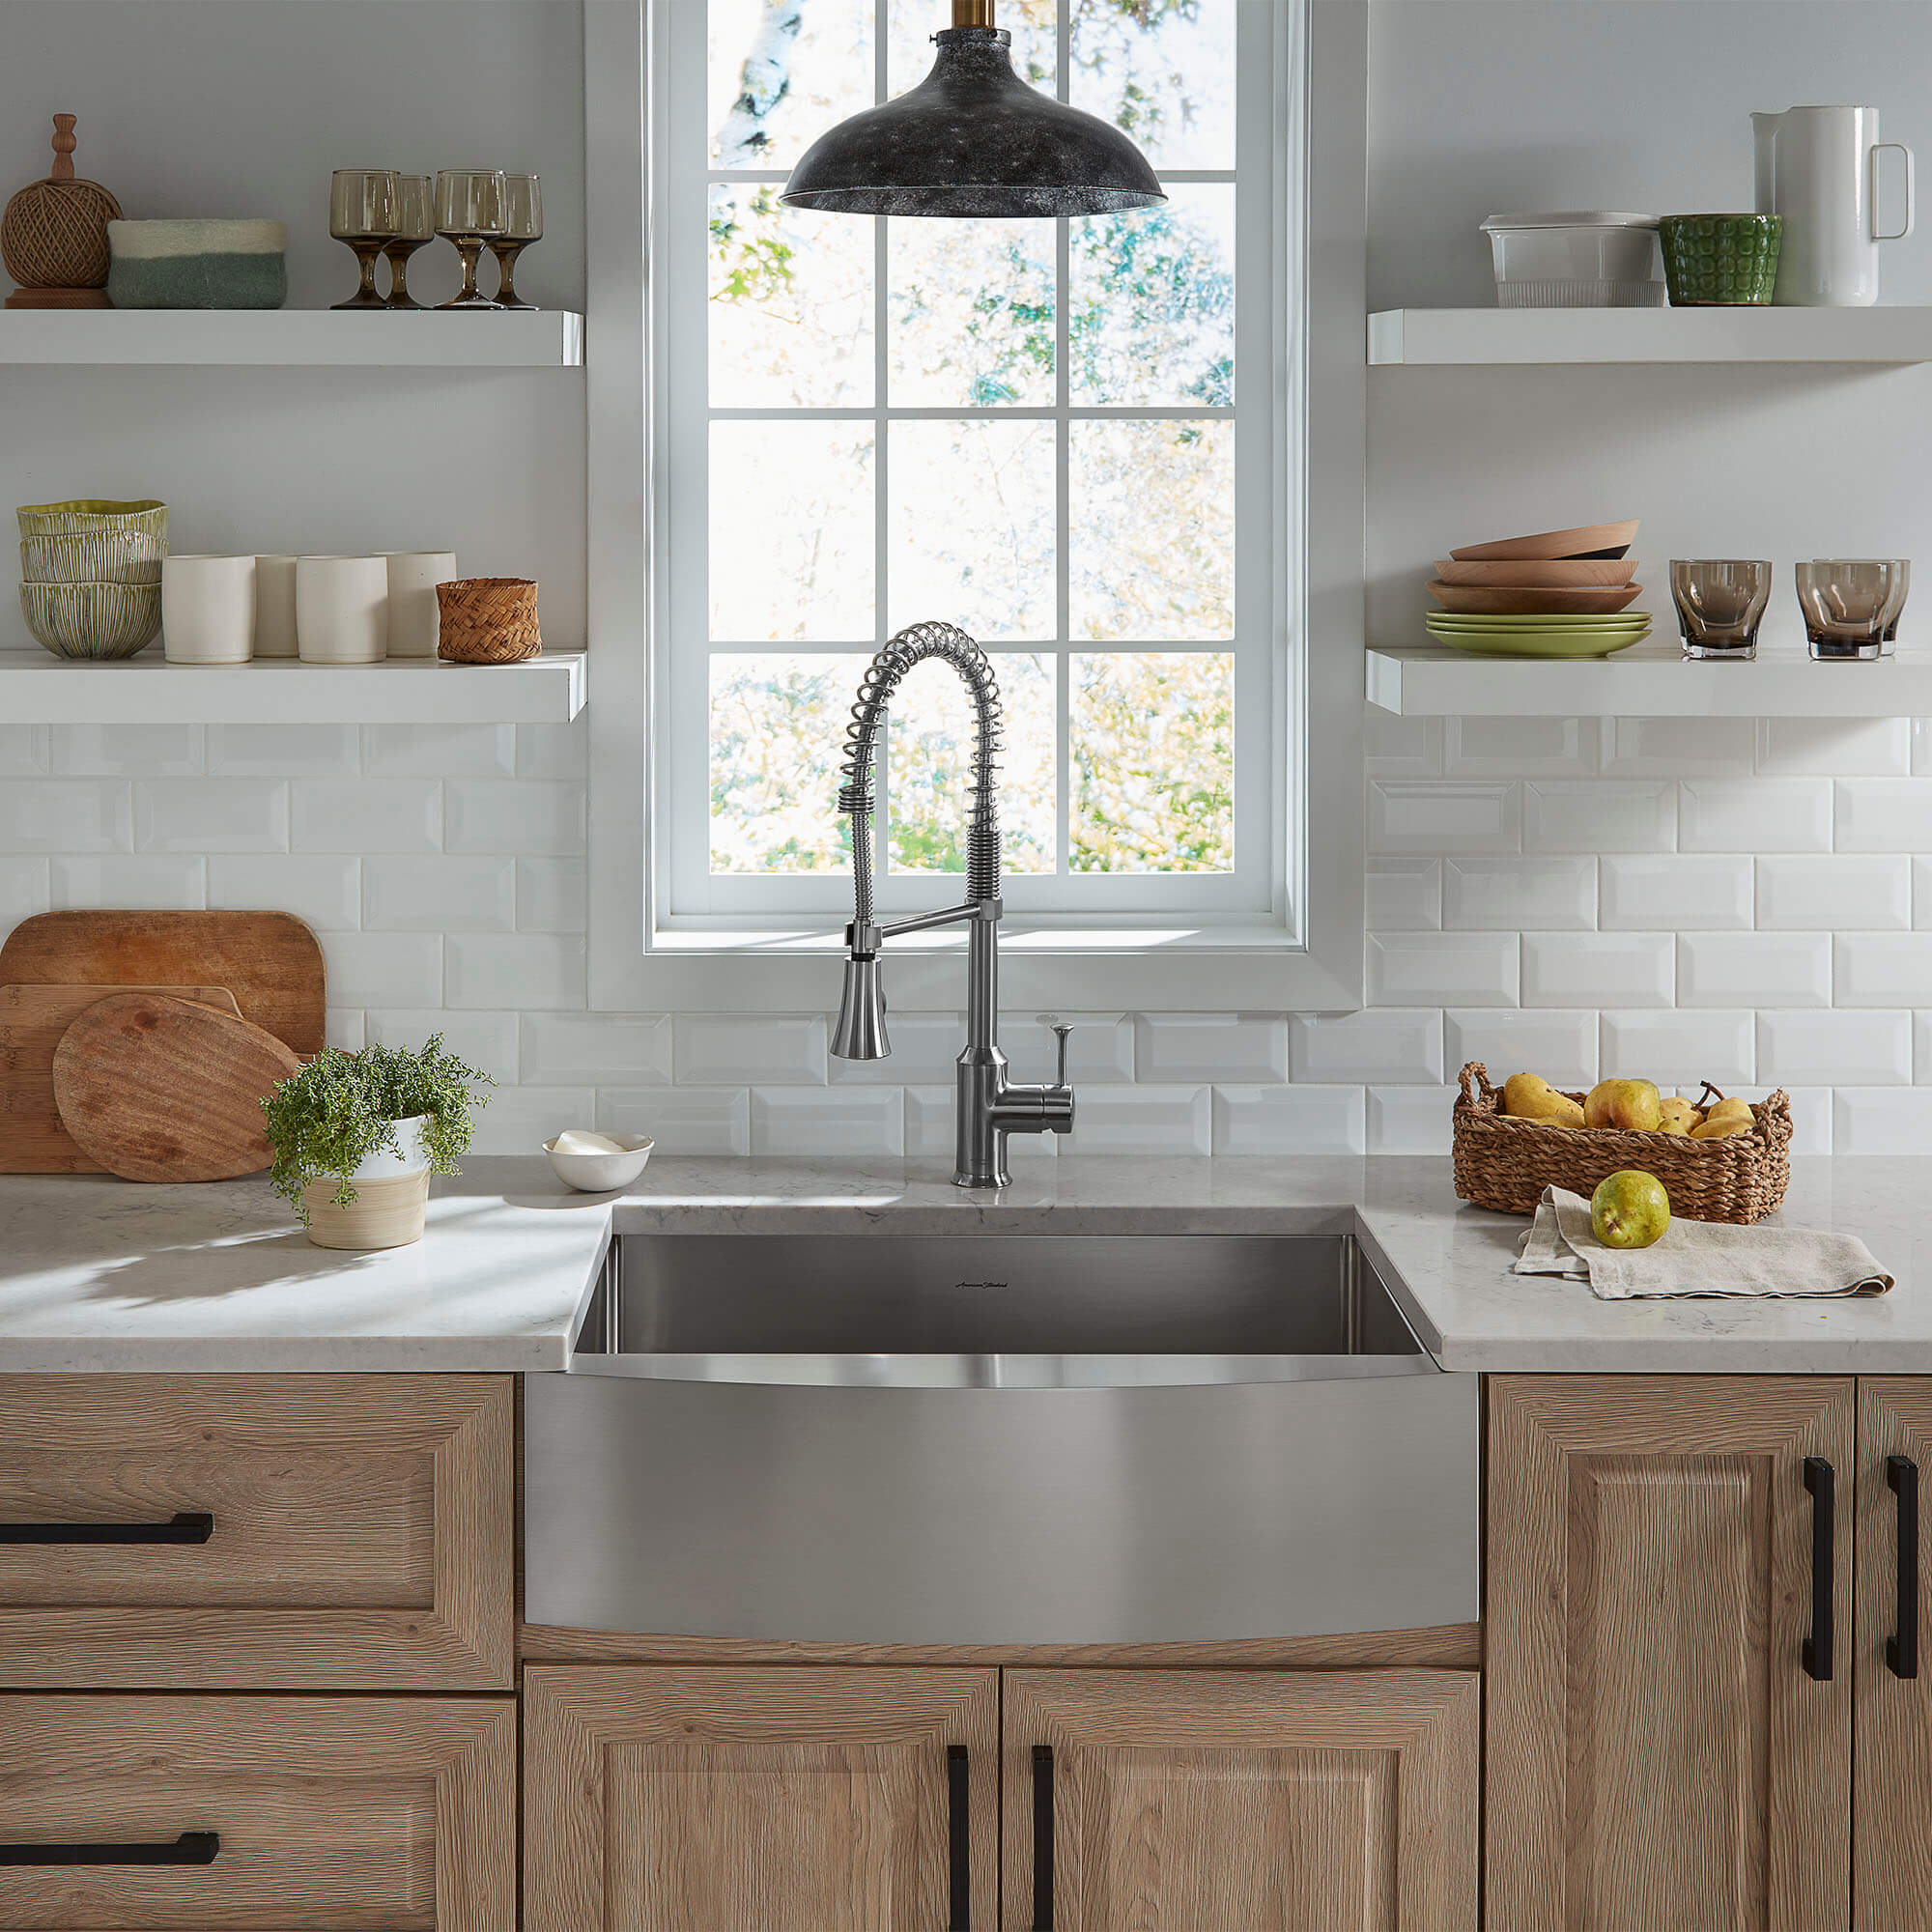 pekoe apron front sink